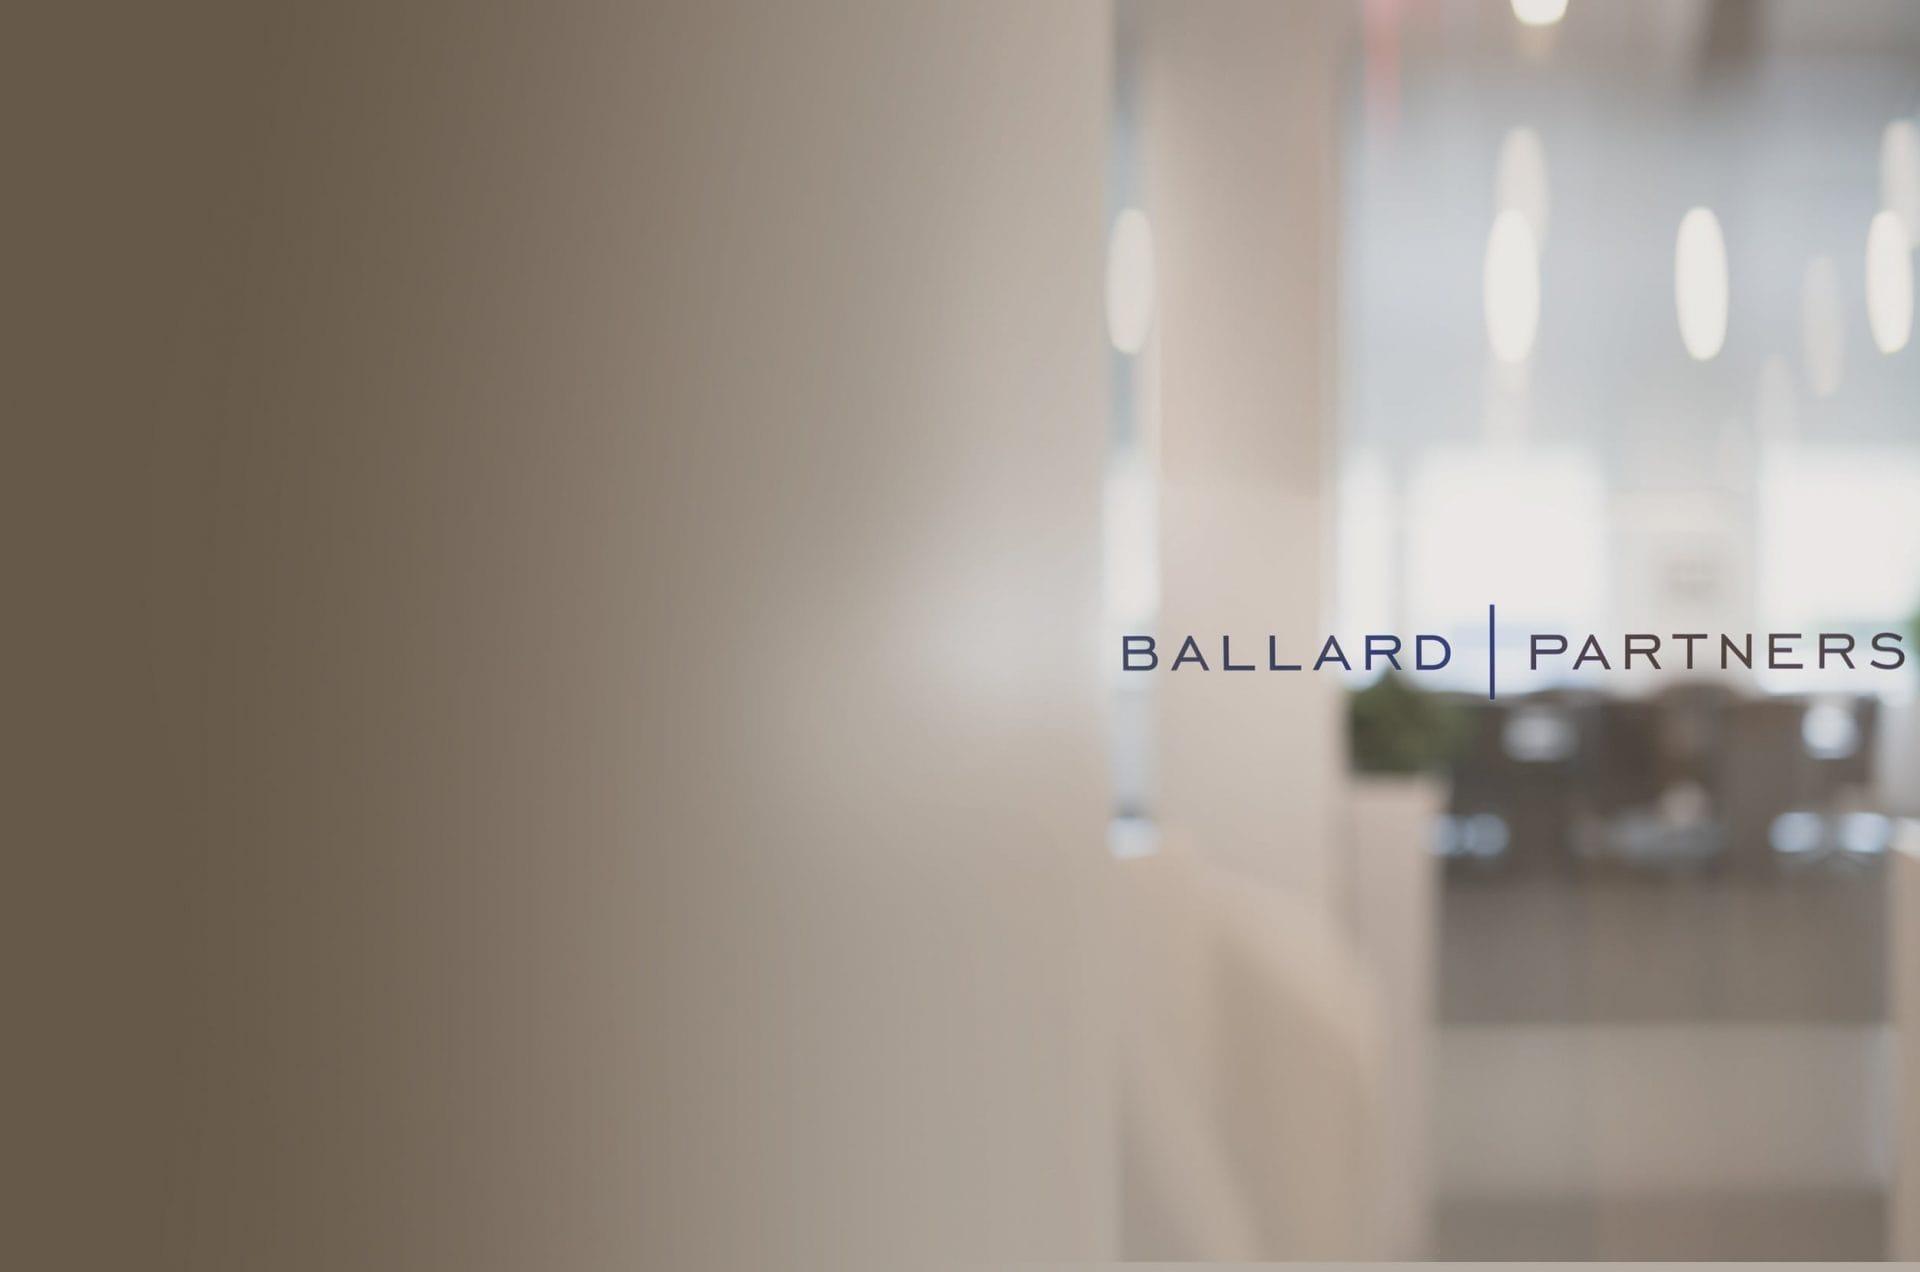 ballard-2.jpg